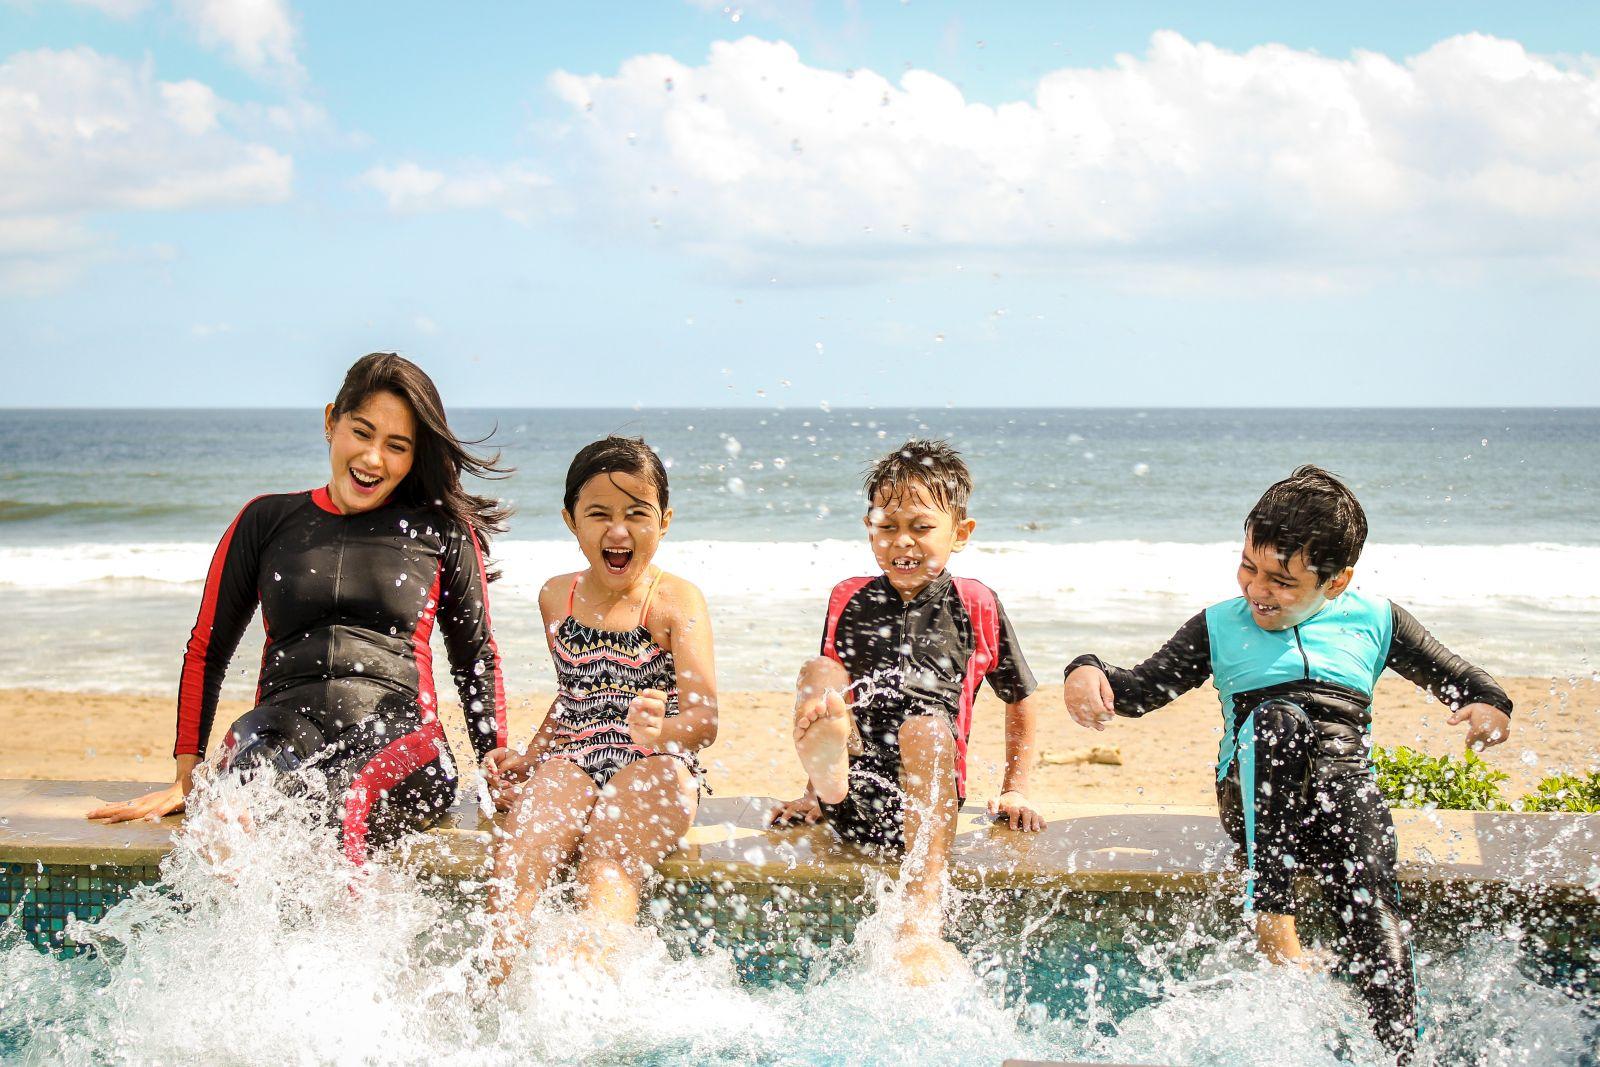 Kids splashing the pool at Anna Maria Island